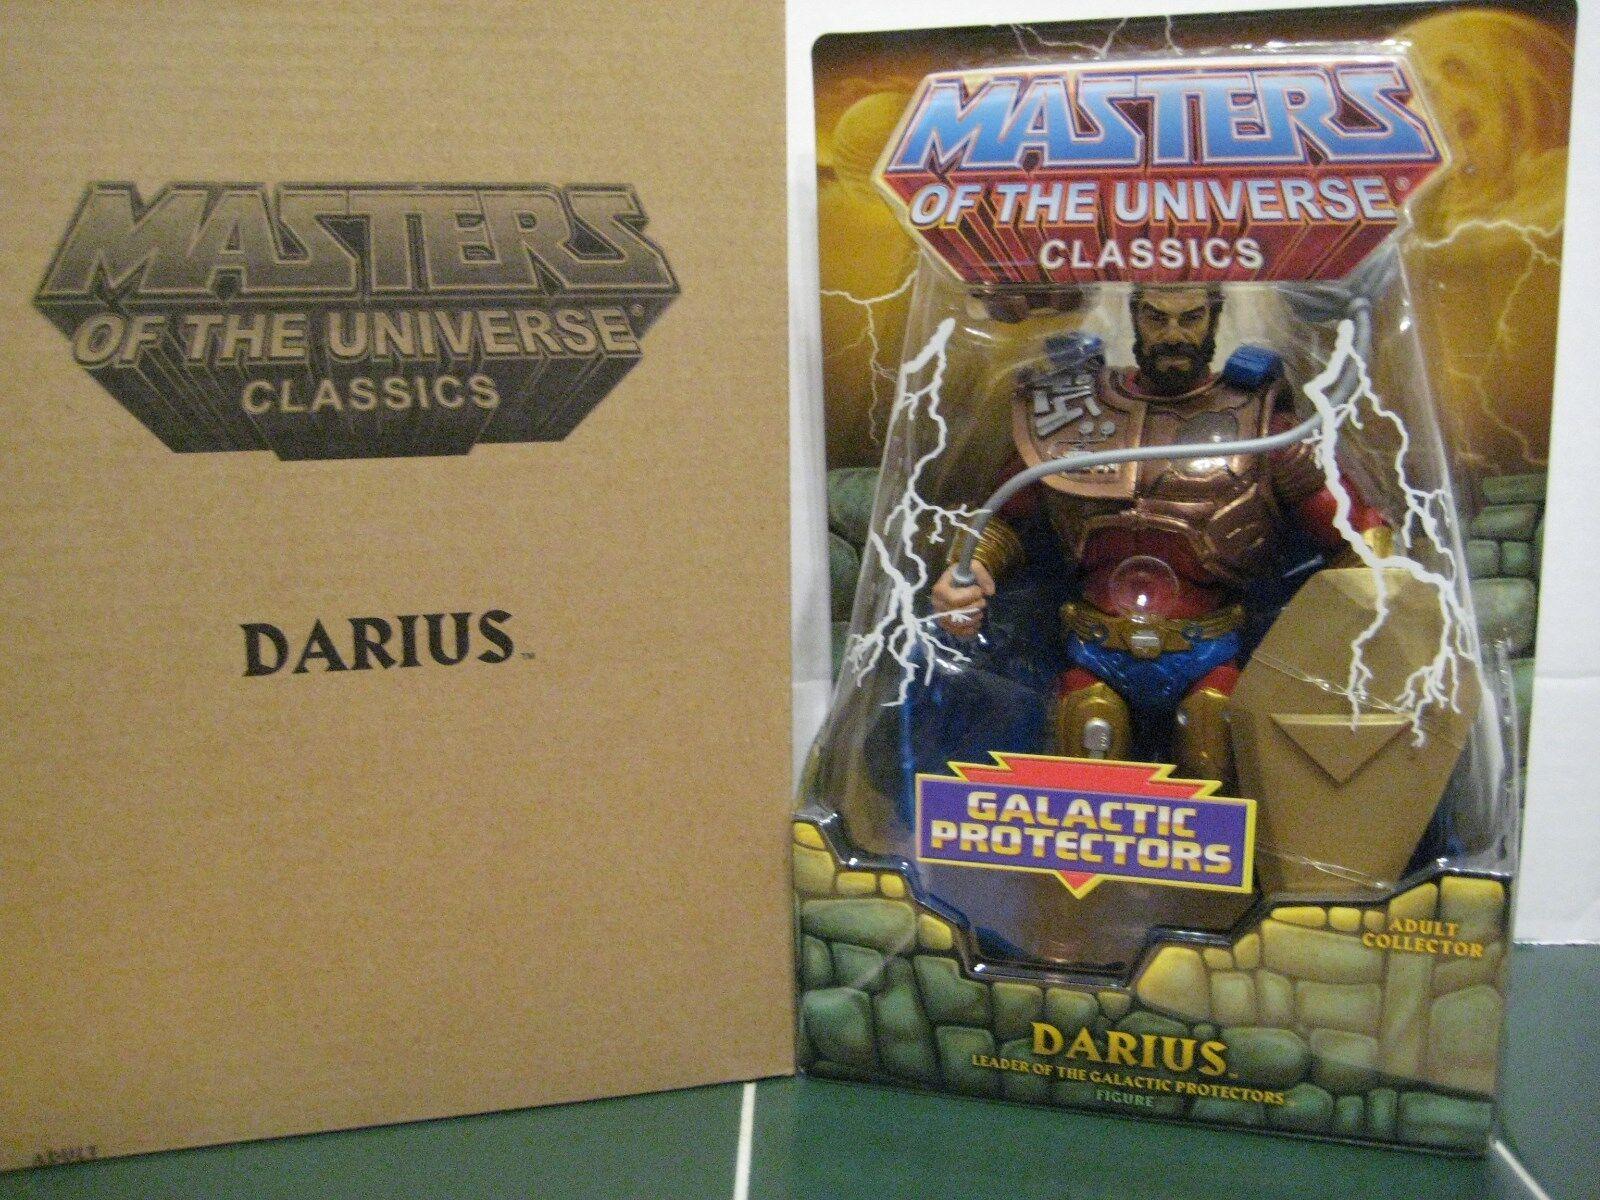 Masters of the Universe Classics Darius Figure Leader of the Galactic Predectors